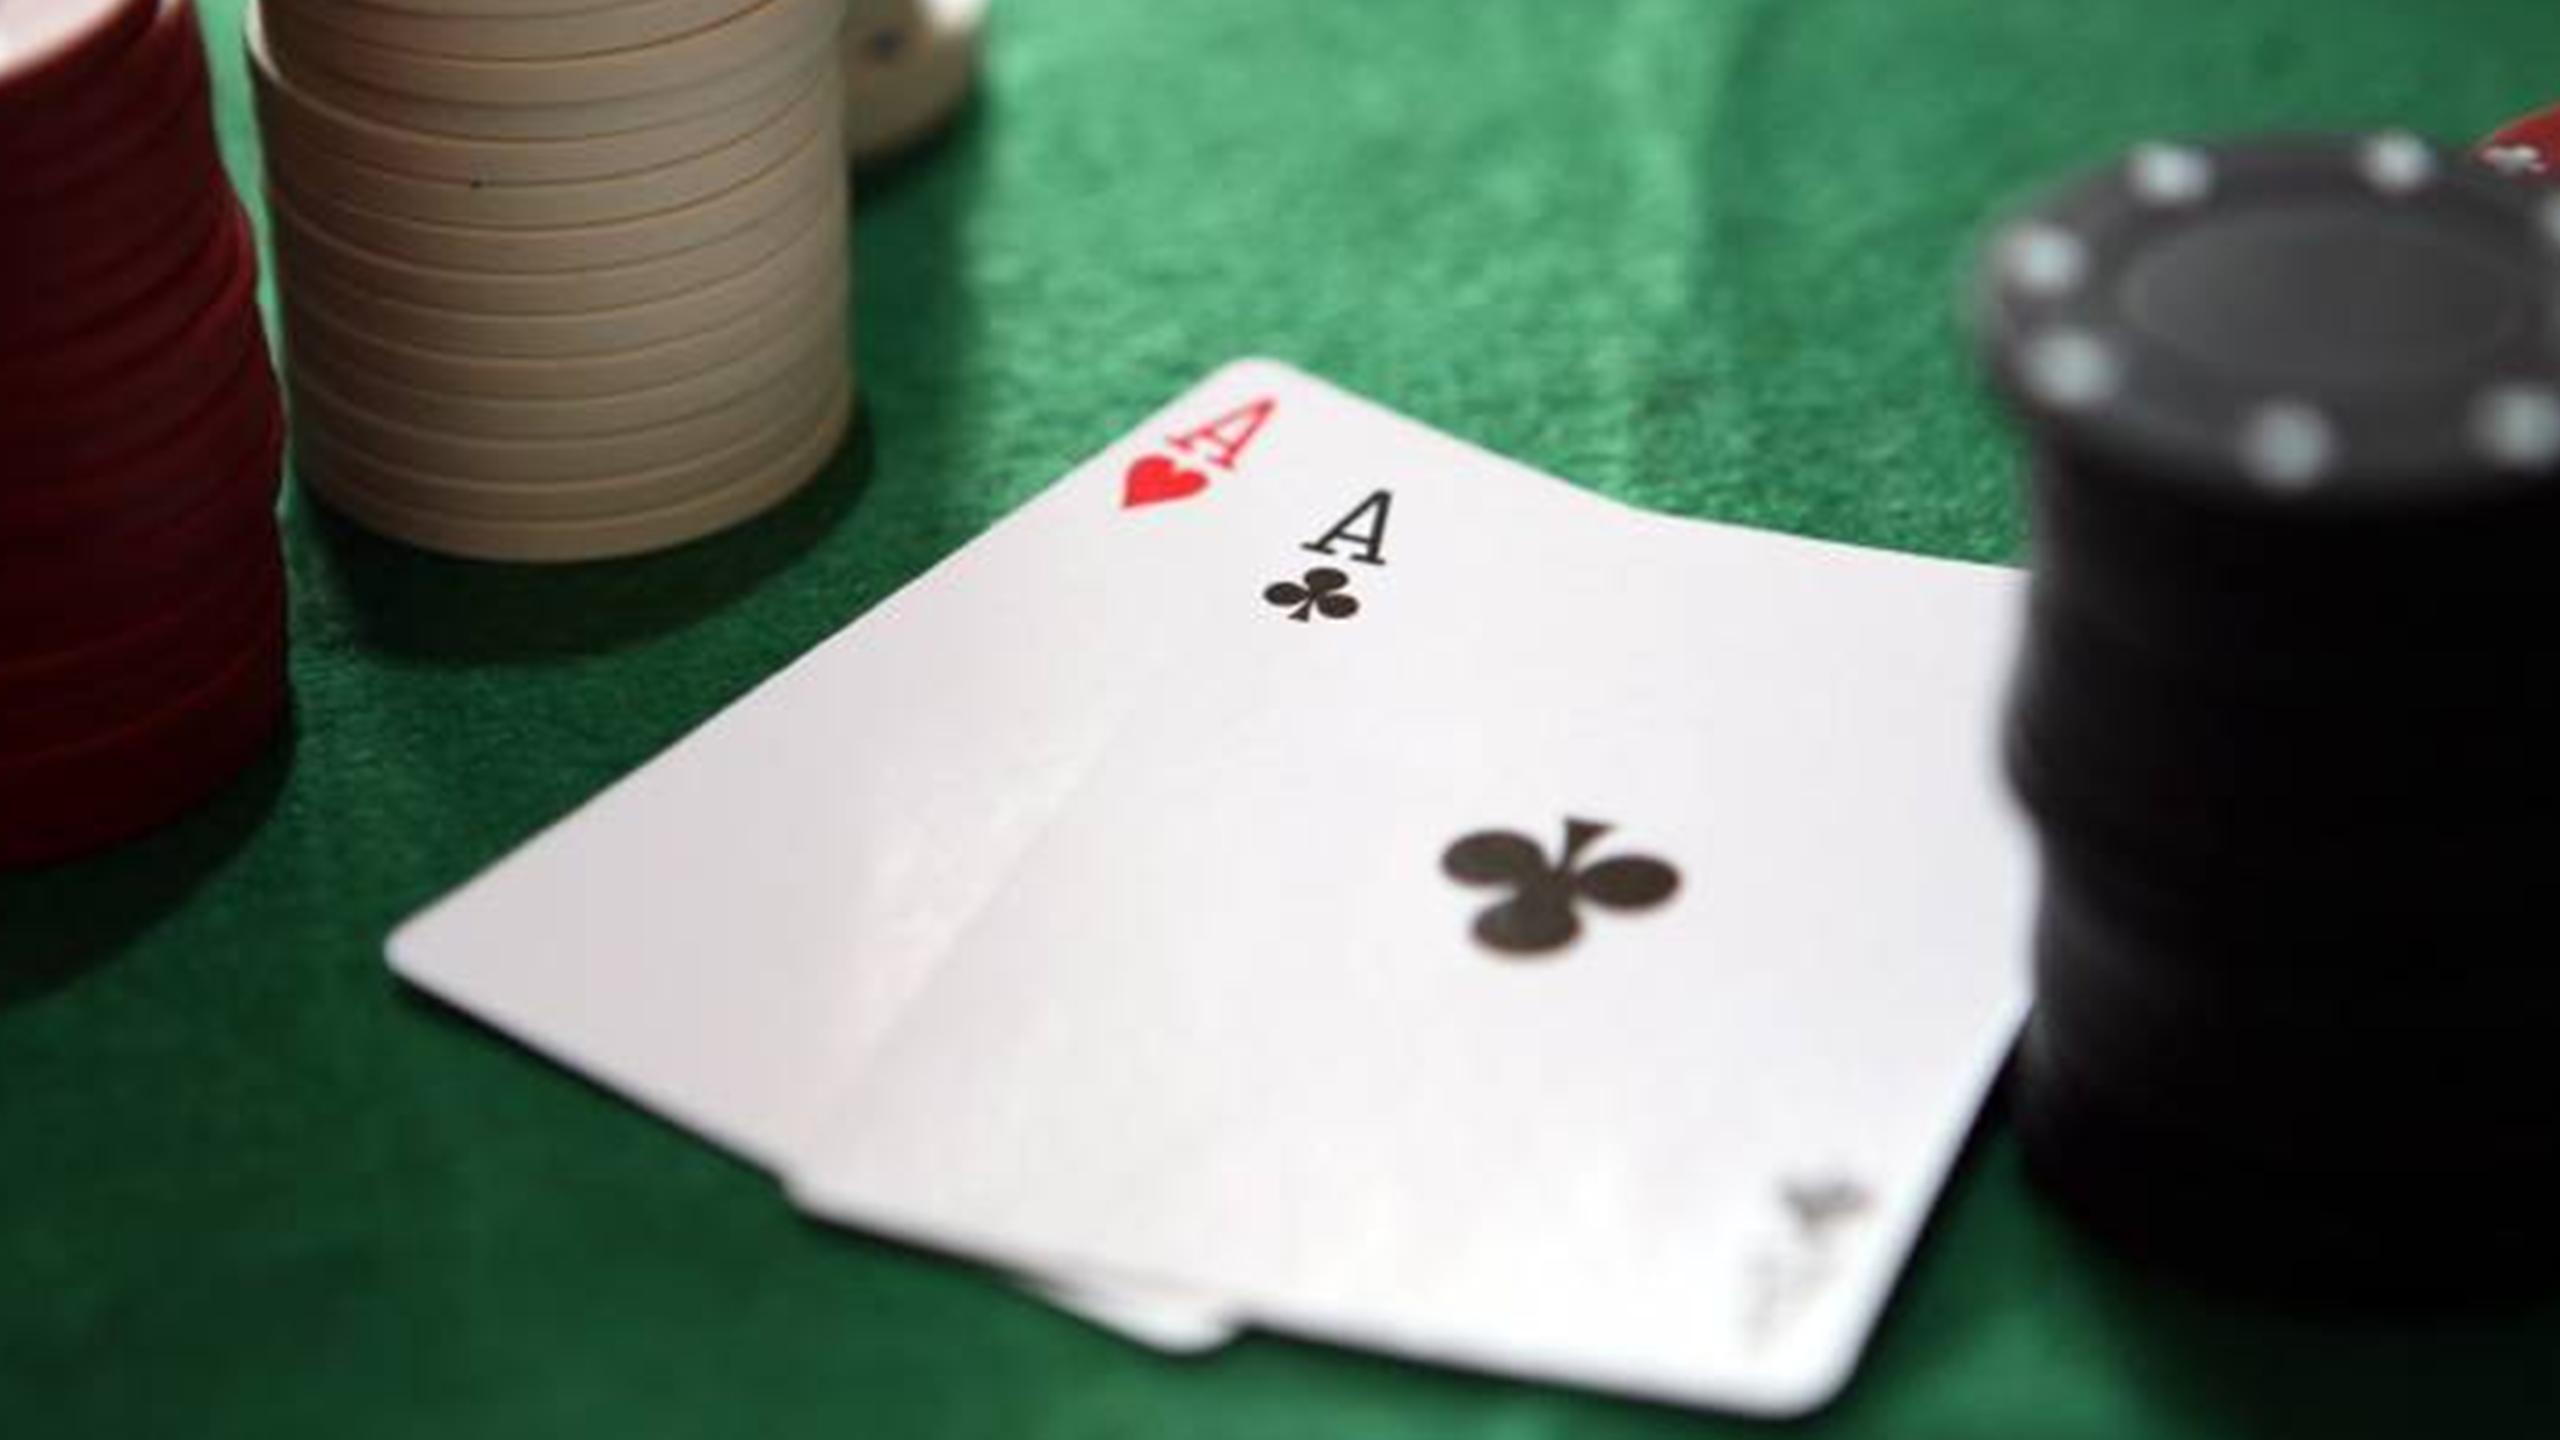 Best csgo gambling sites to make profit